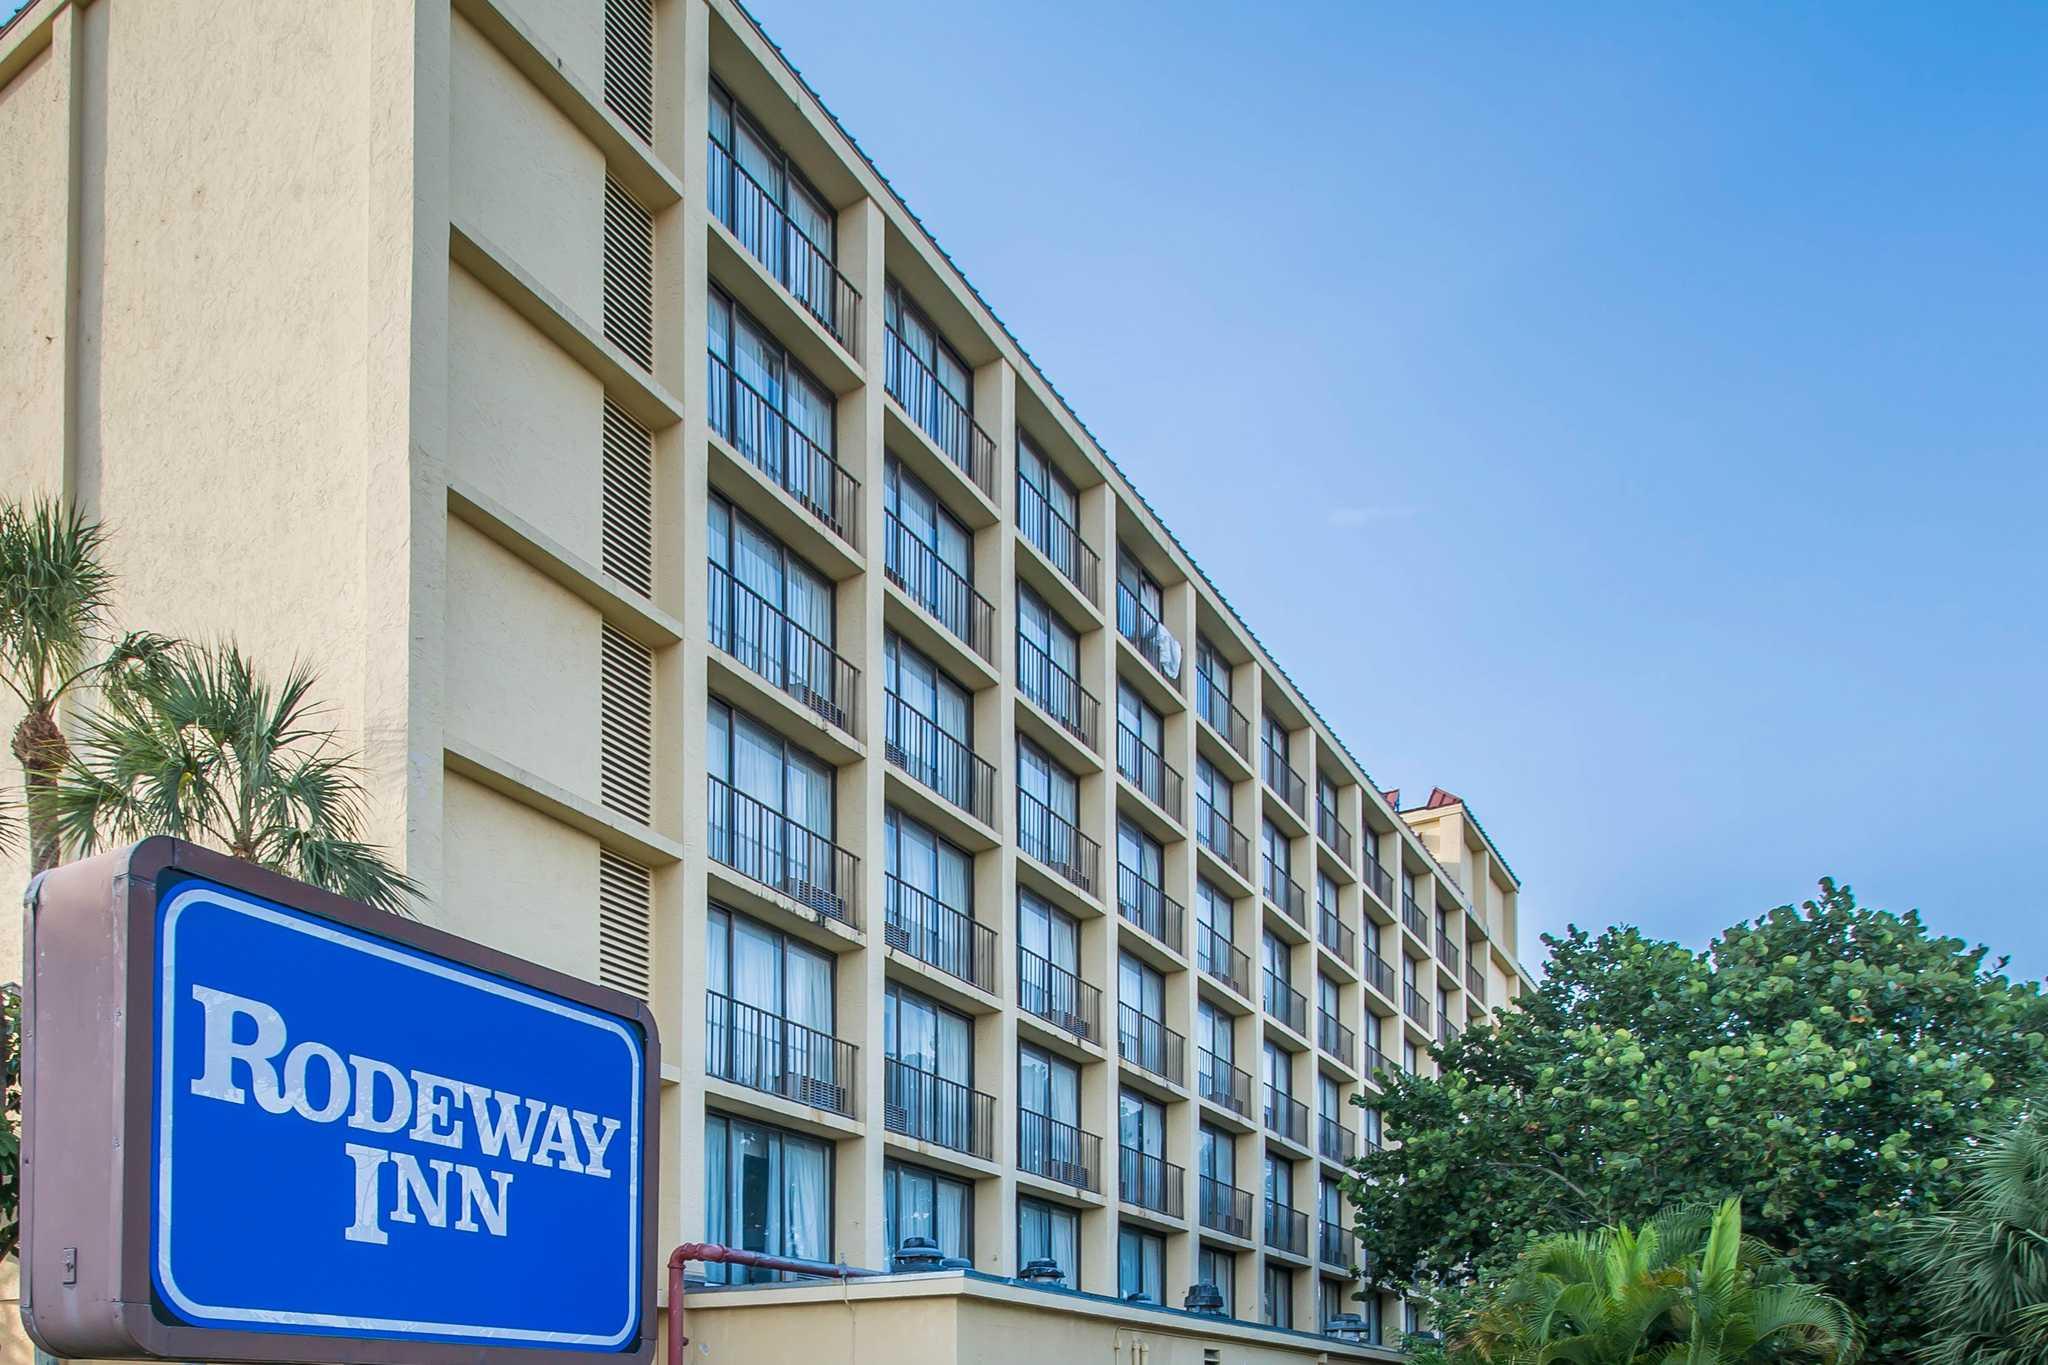 Rodeway Inn Miami image 1